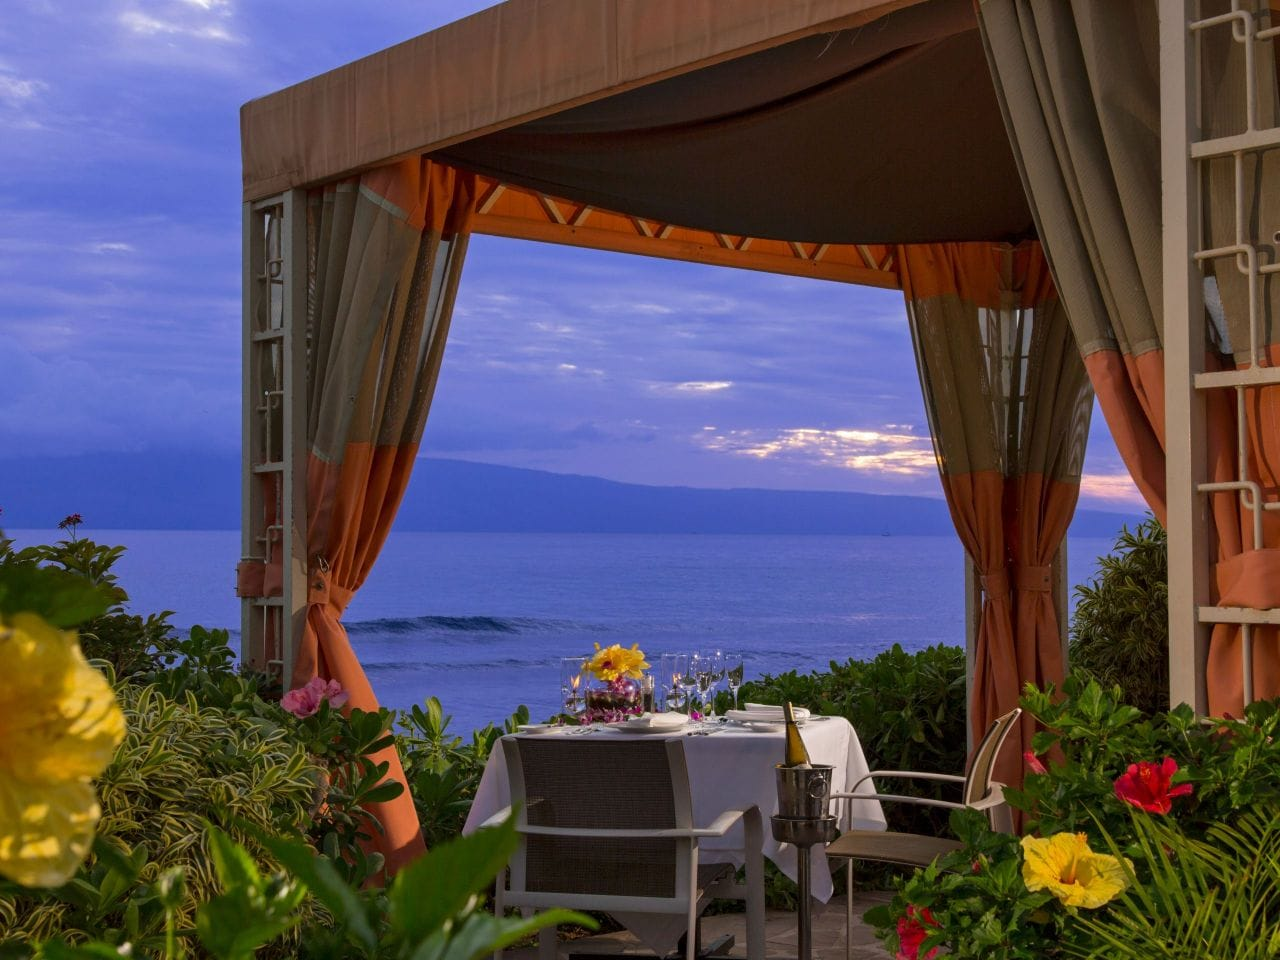 Oceanside Dining Cabana